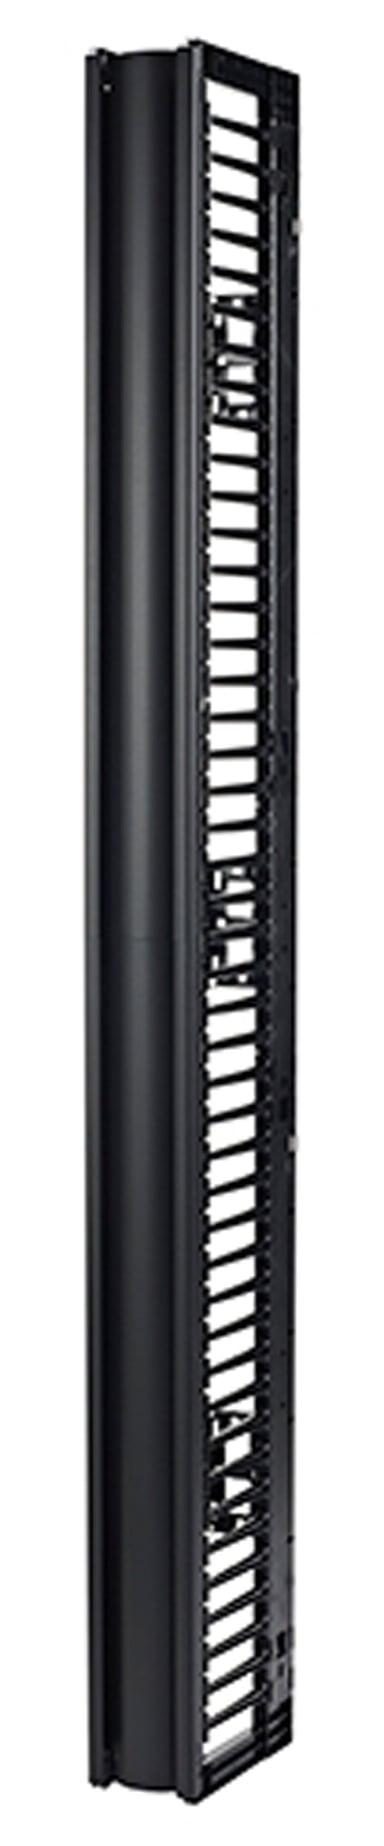 APC Vertikal kabelhanterare